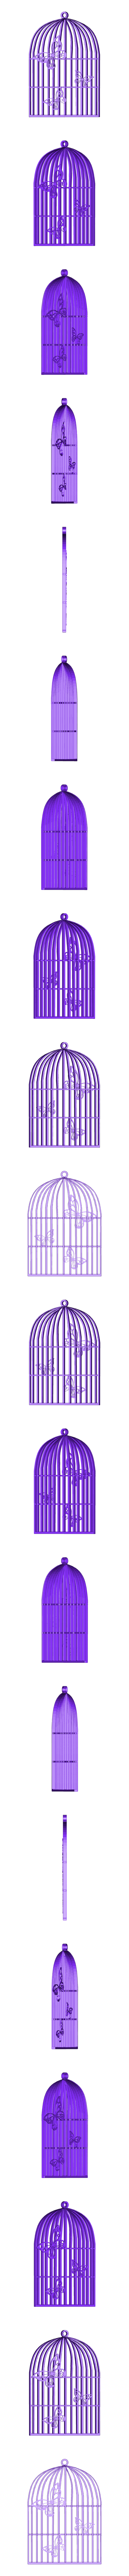 Pendentif Cage Papillon.STL Download 3DS file Butterfly Cage Pendant • 3D printing design, emilie3darchitecture